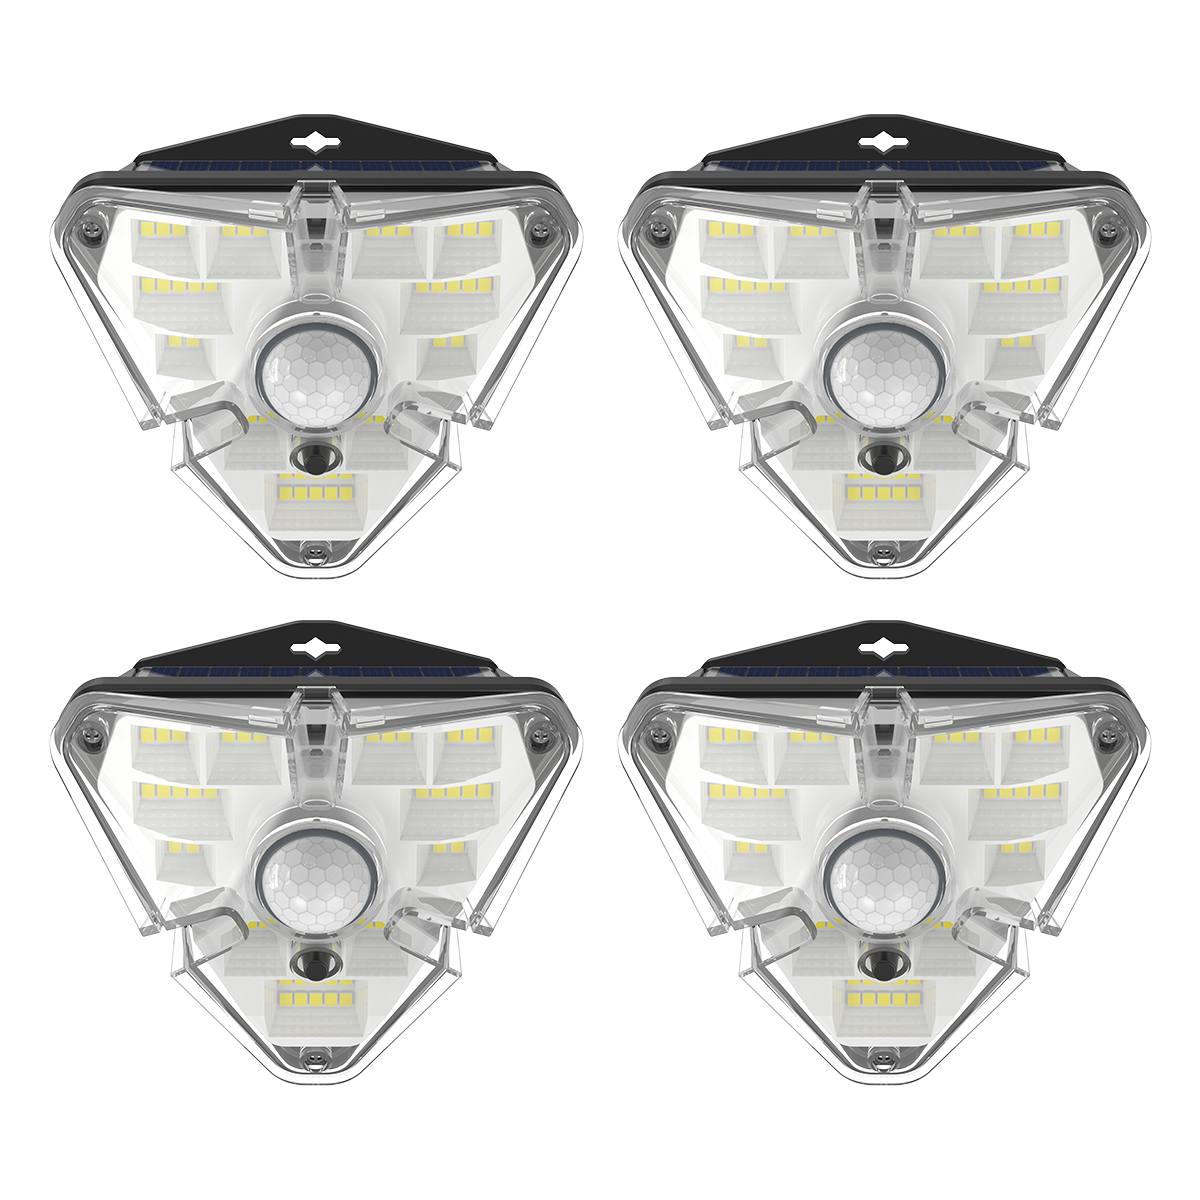 Лампа наружная индукционная (комплект 4 шт.) BASEUS Solar Energy Lamp 4 IPX5, с 1200mAH (DGNEN-B01)